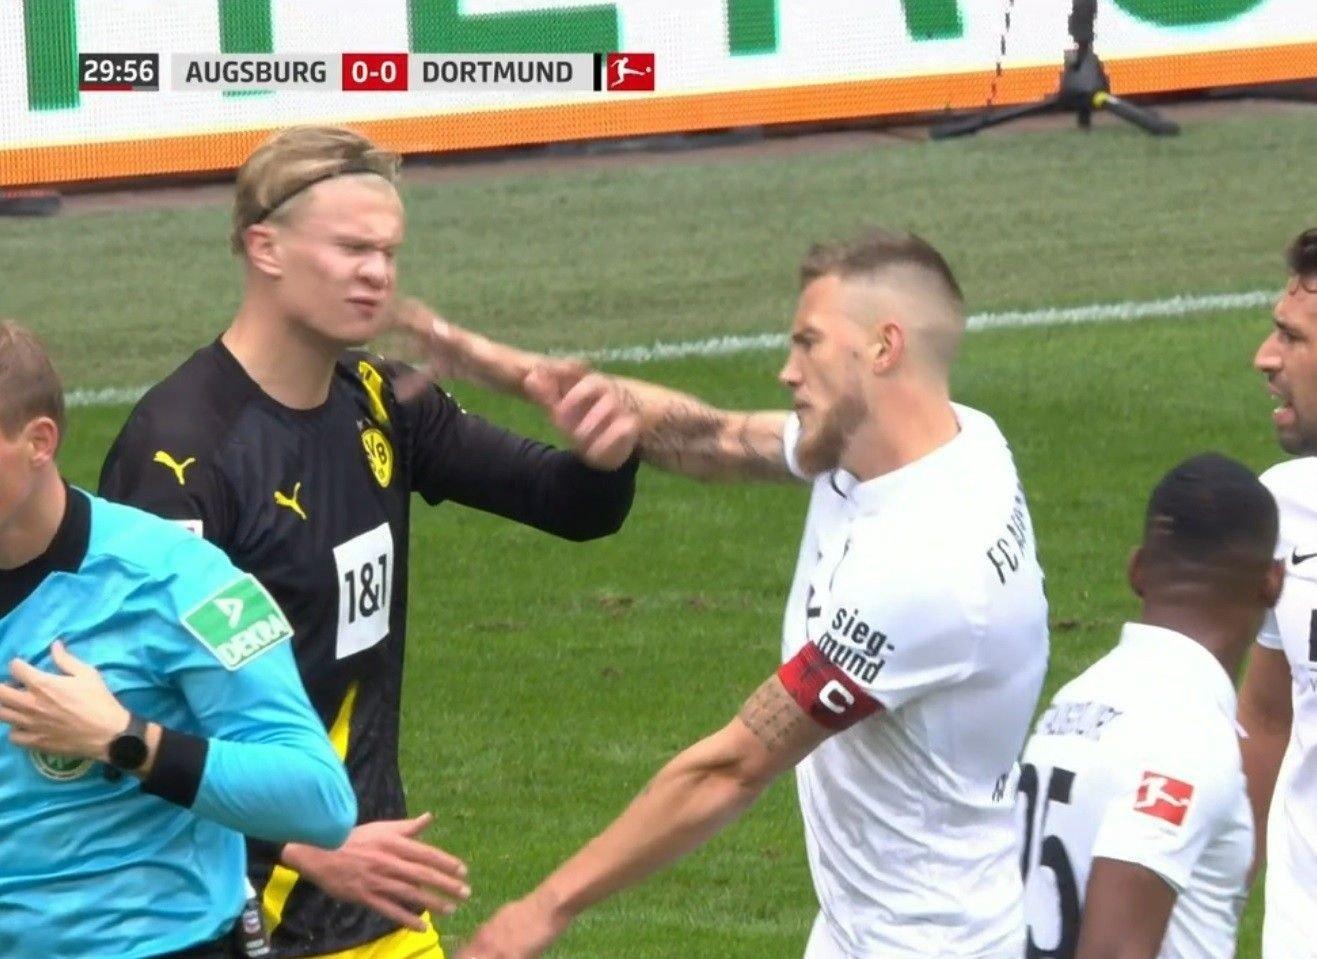 Erling Braut Haaland Borussia Dortmund Haaland I Handgemeng Da Dortmund Tapte Mot Augsburg